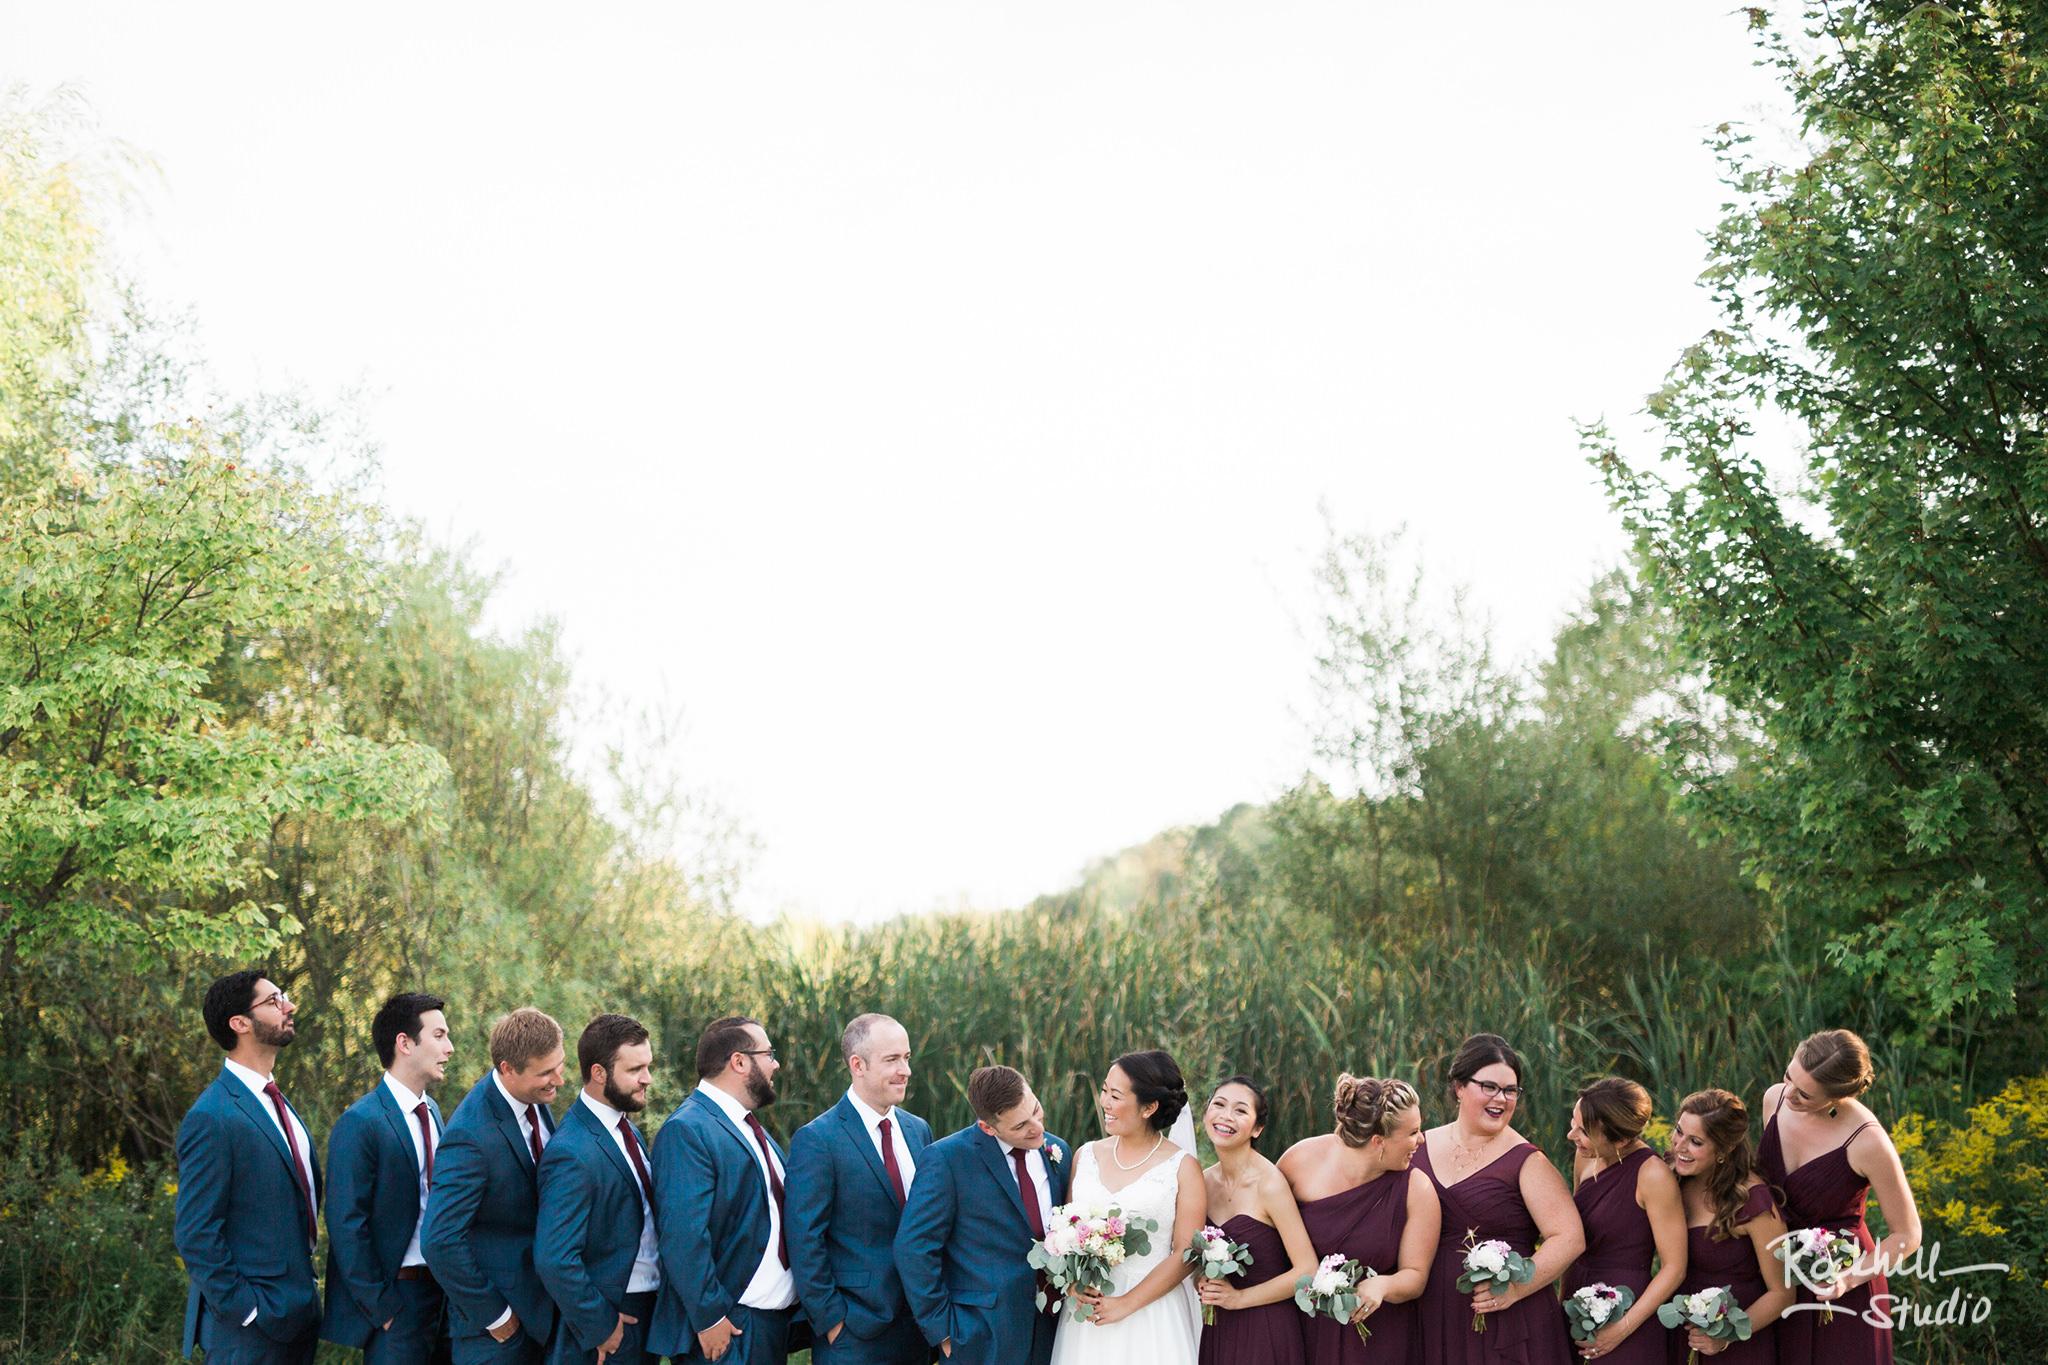 Northport wedding, bridal party, Traverse city wedding photographer Rockhill Studio